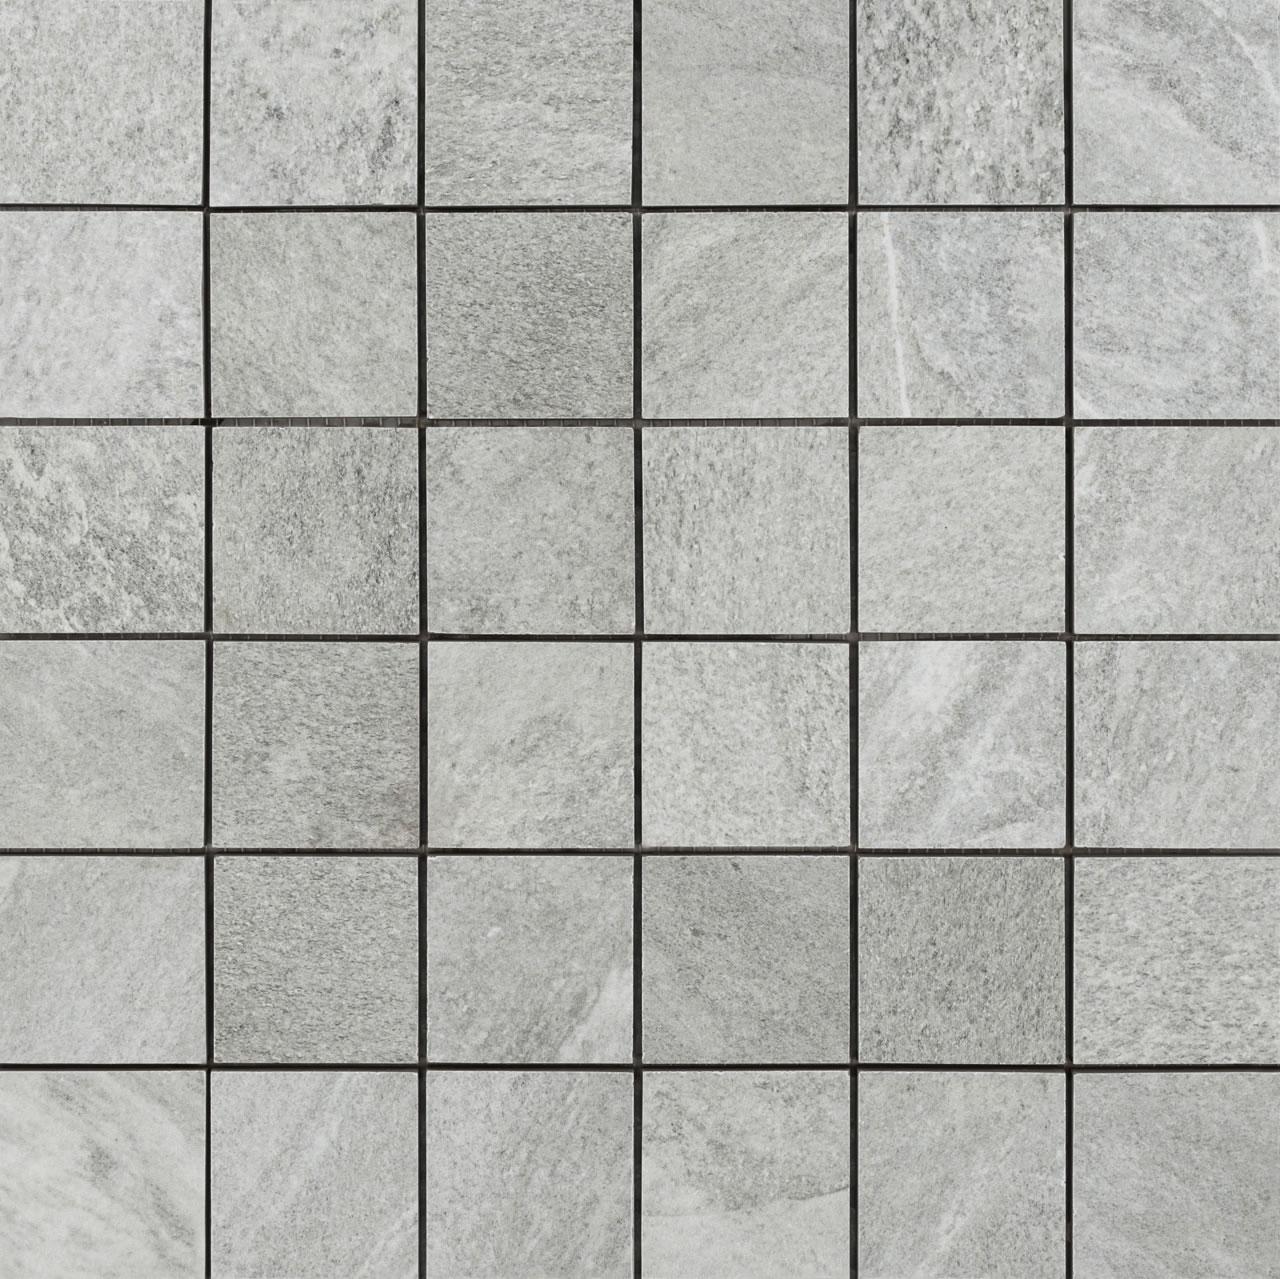 riverstone t-1000 gray 30×30